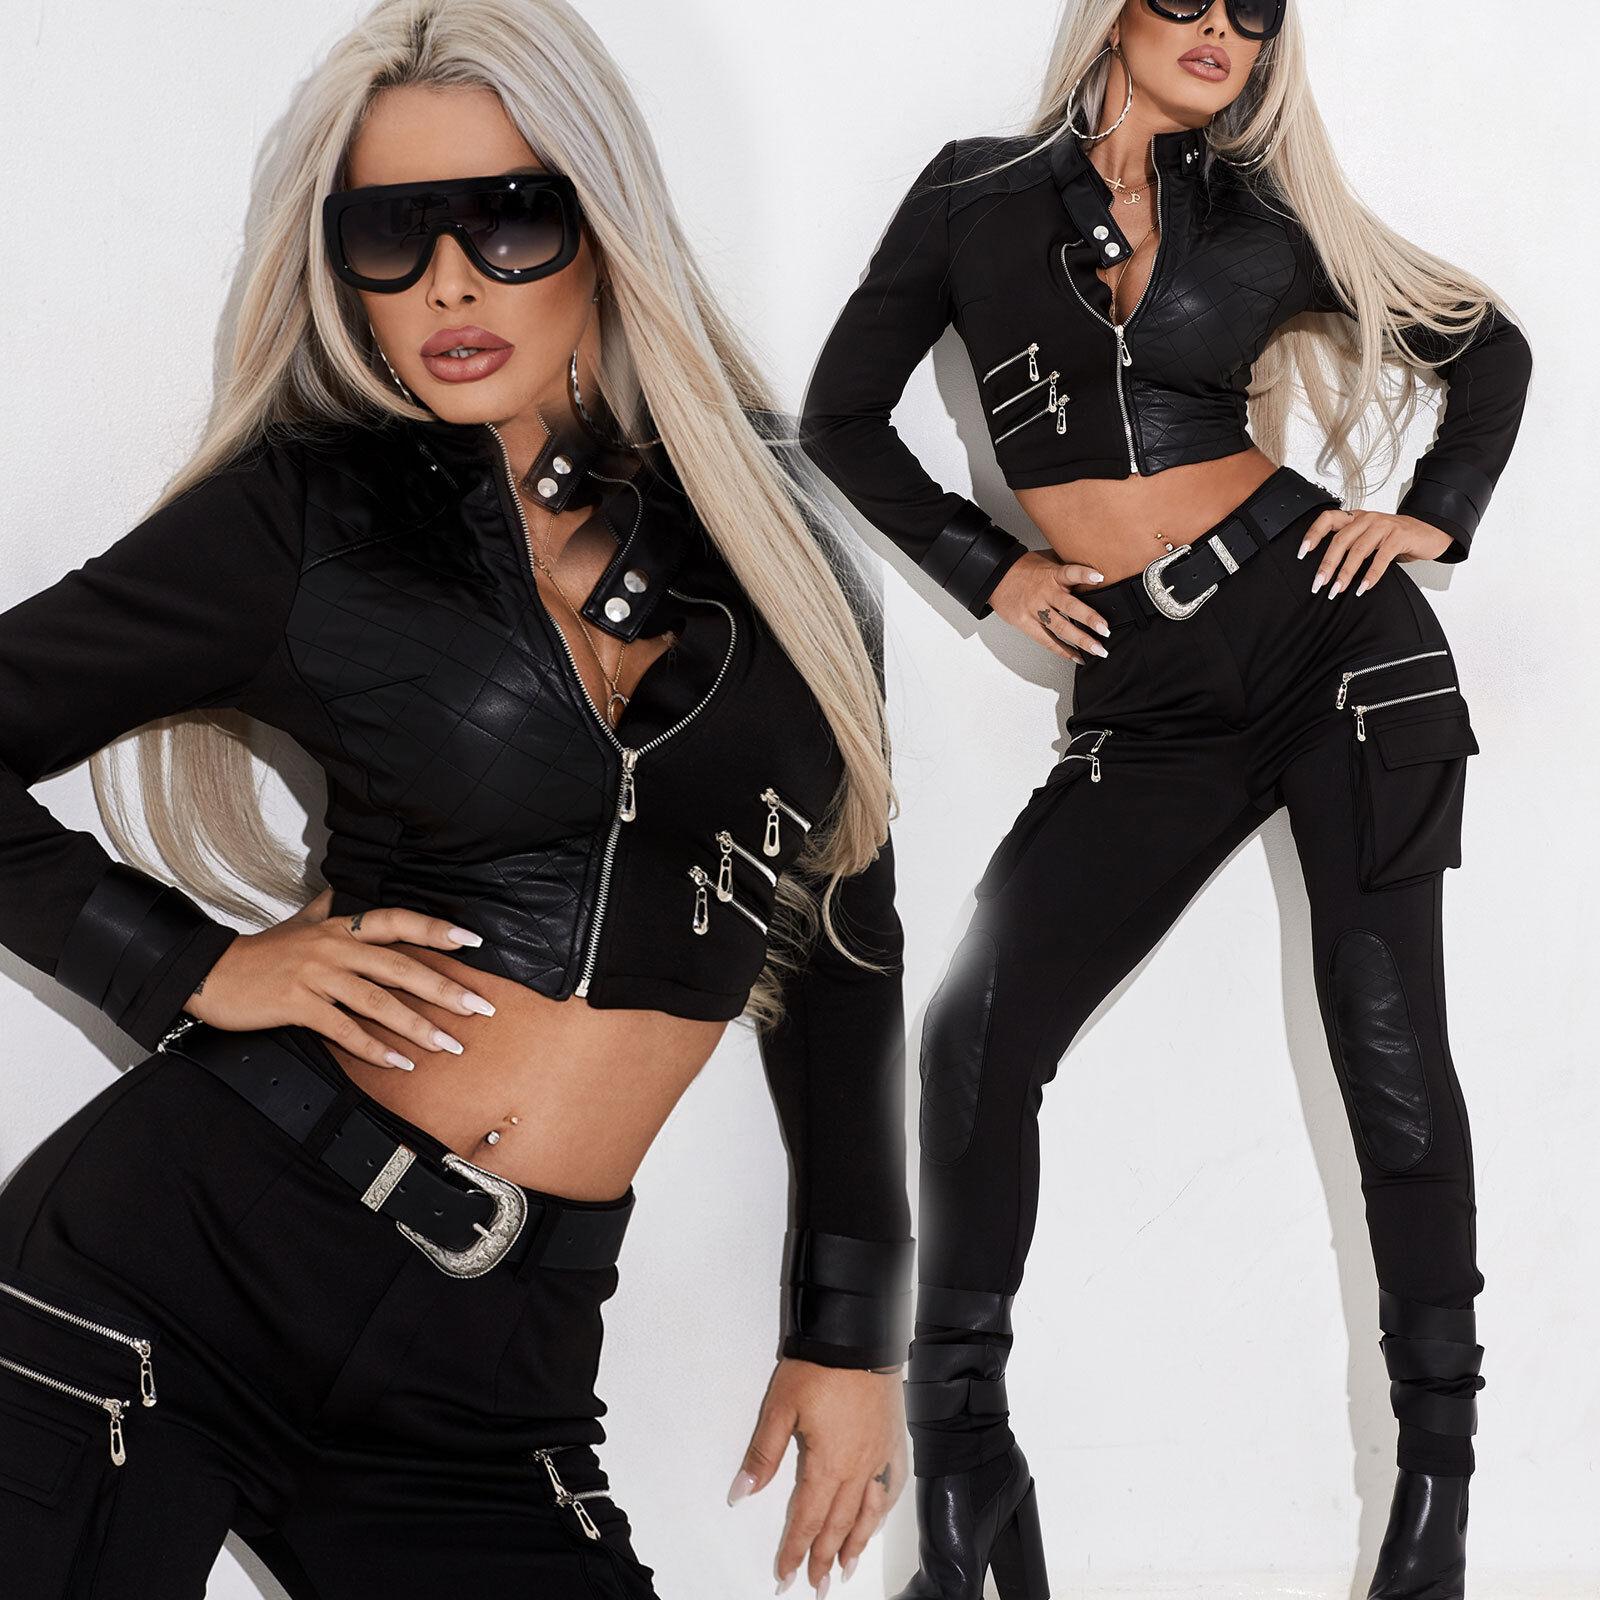 By Alina 2-Divider damen Jacke High-Waist Skinny Trousers + Jacke Leather guarda XS S M